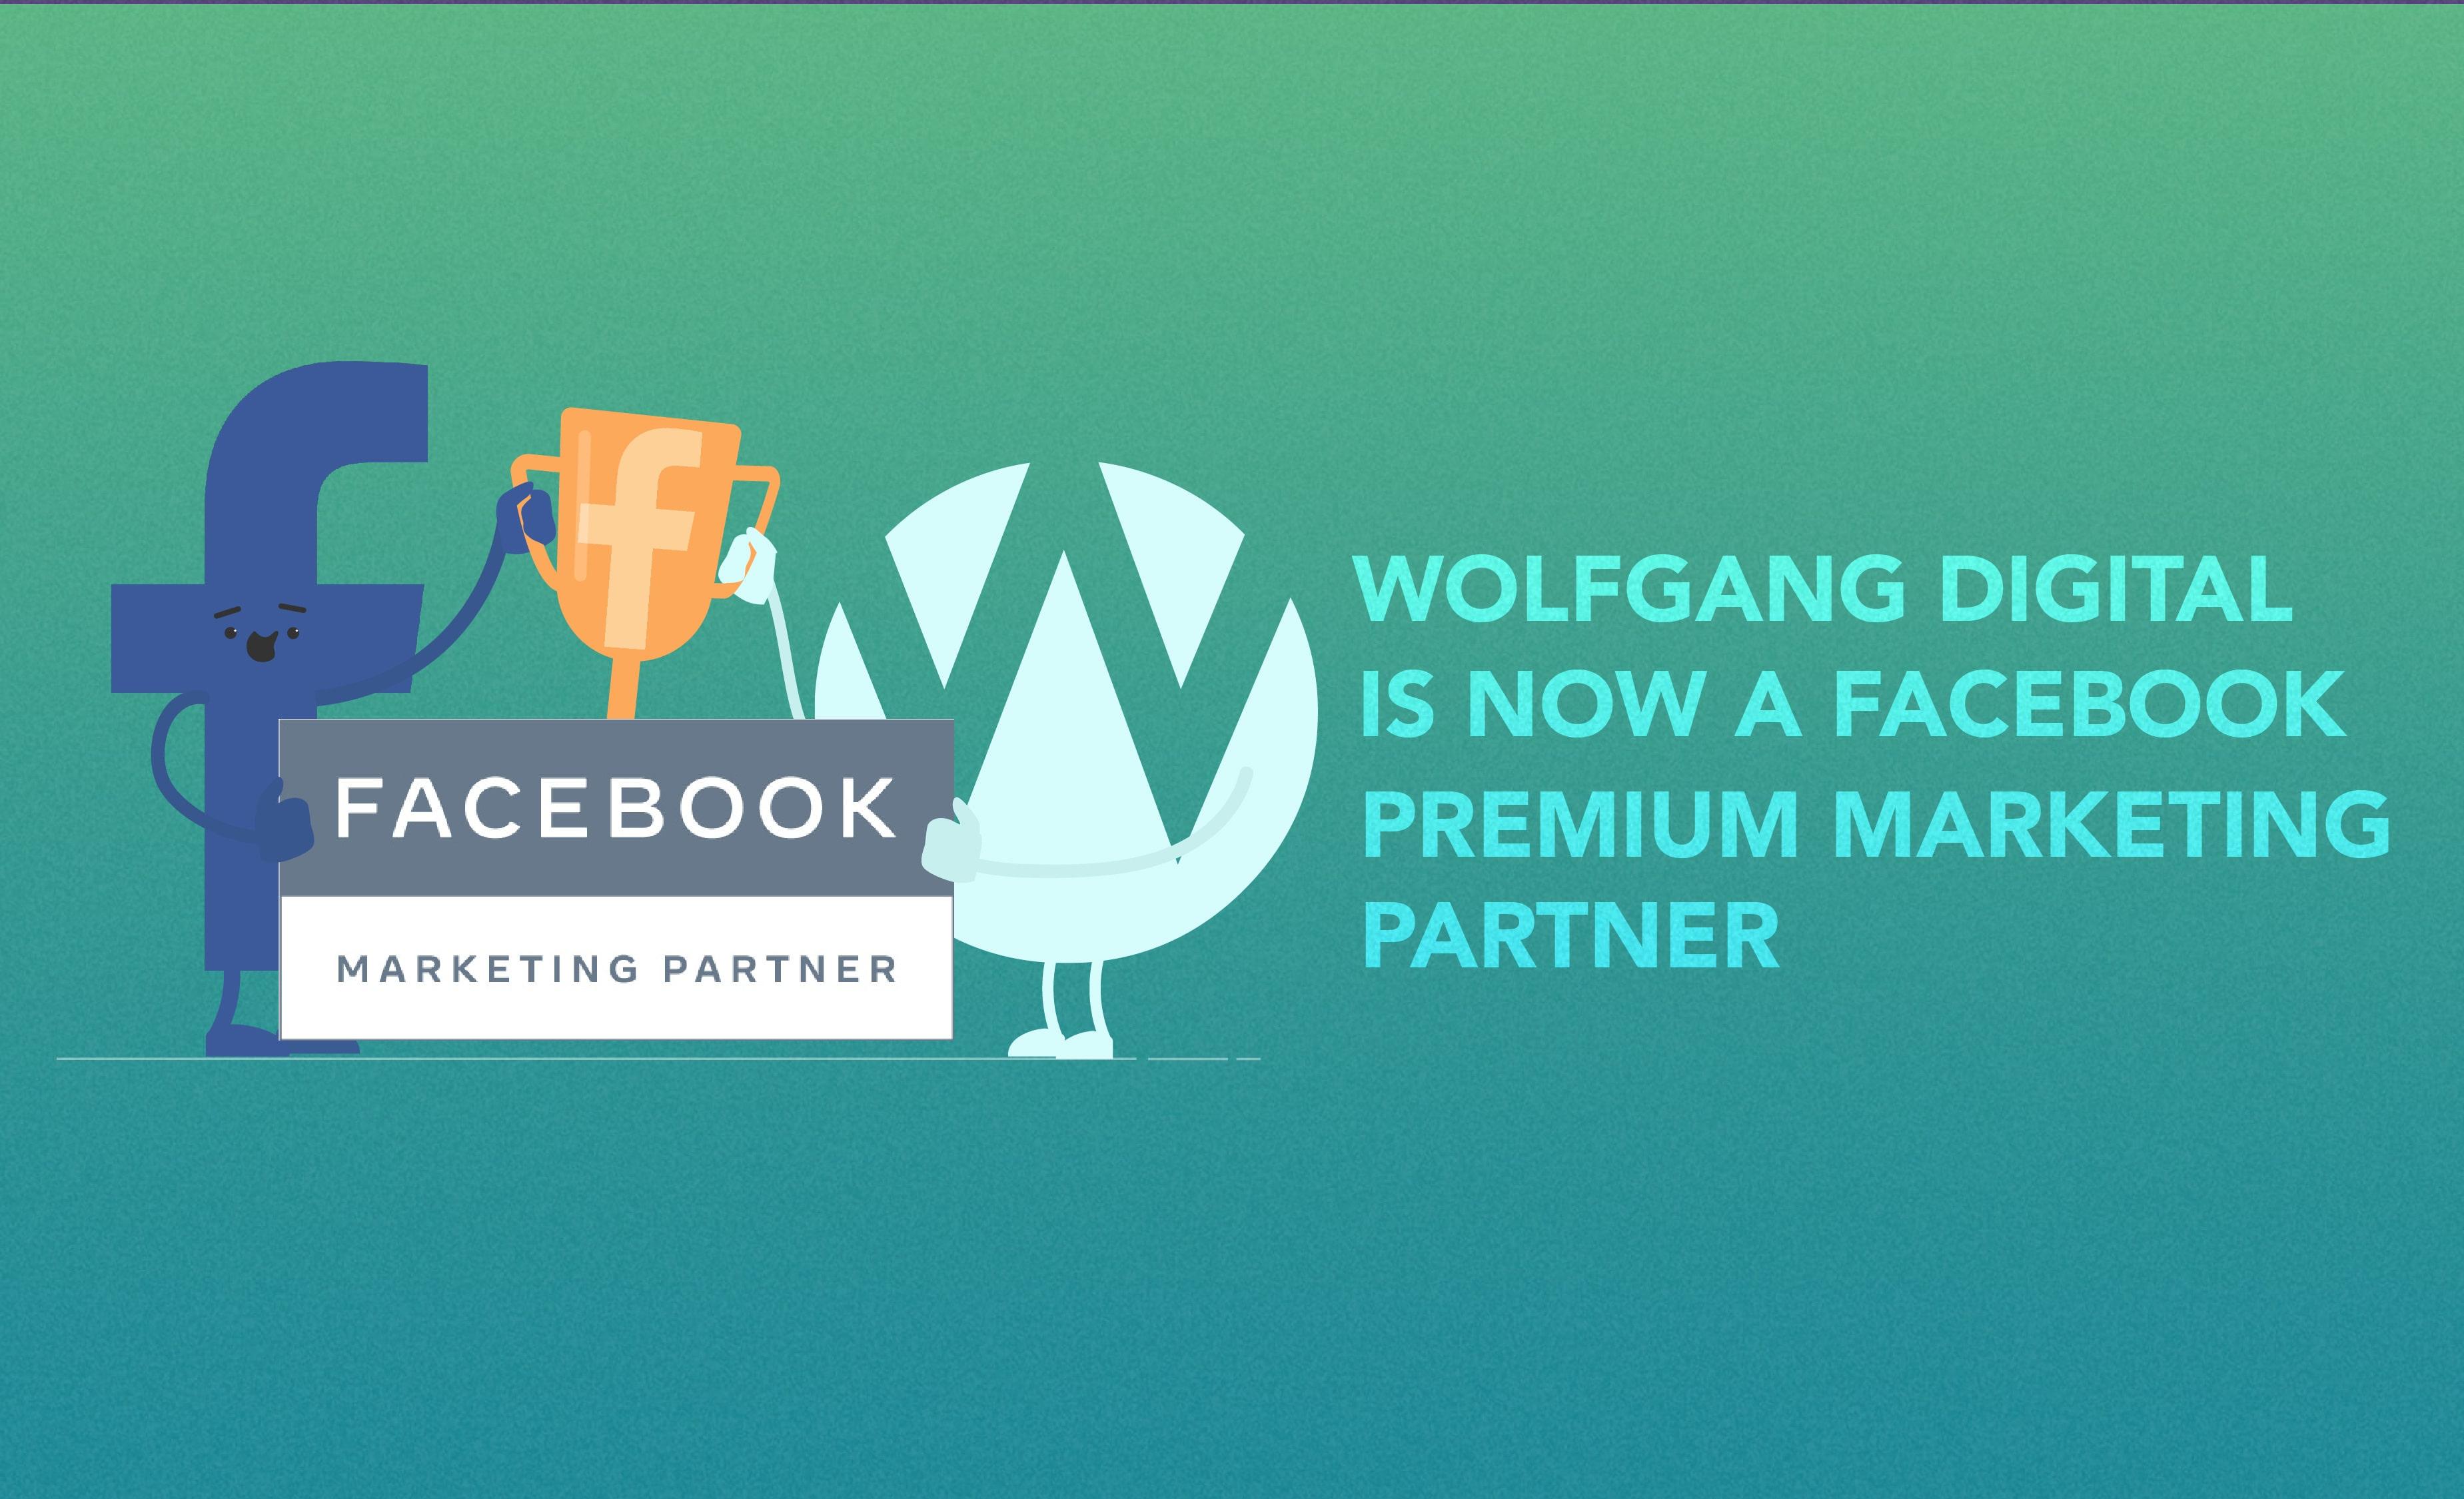 Wolfgang Digital is now a Facebook Premium Marketing Partner